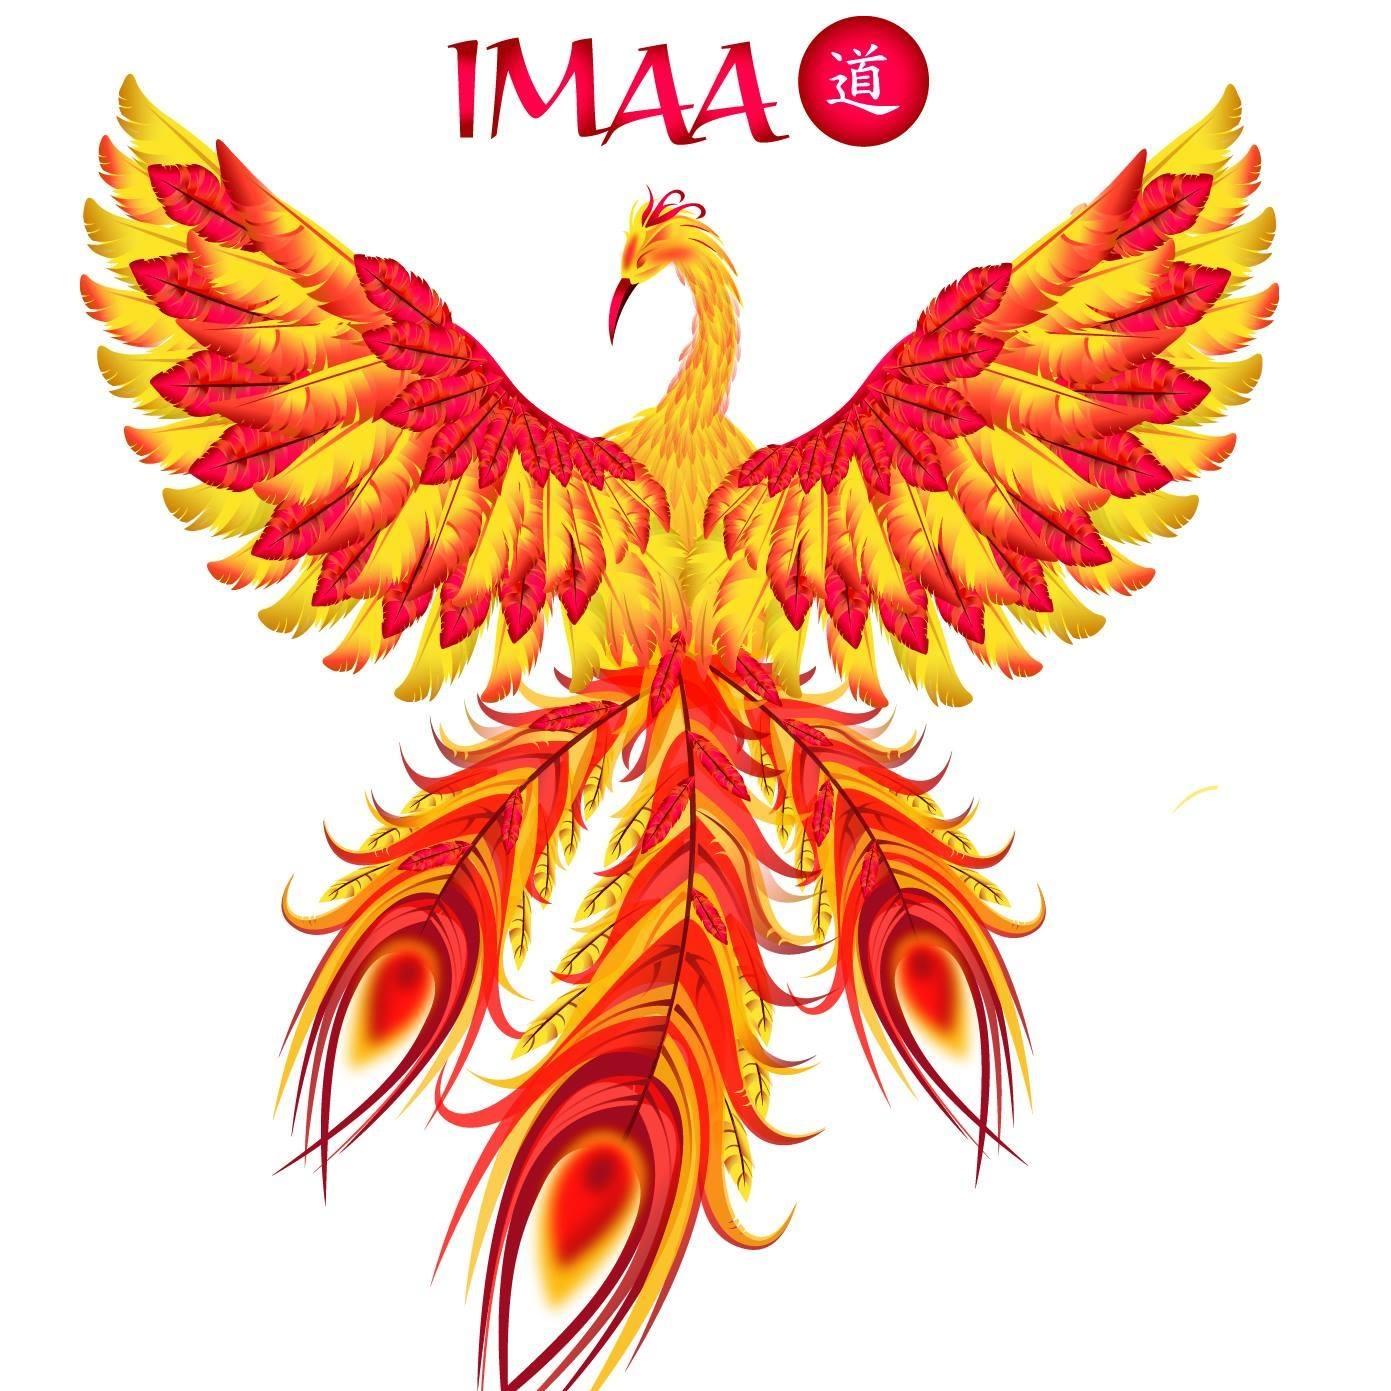 Accademia IMAA logo